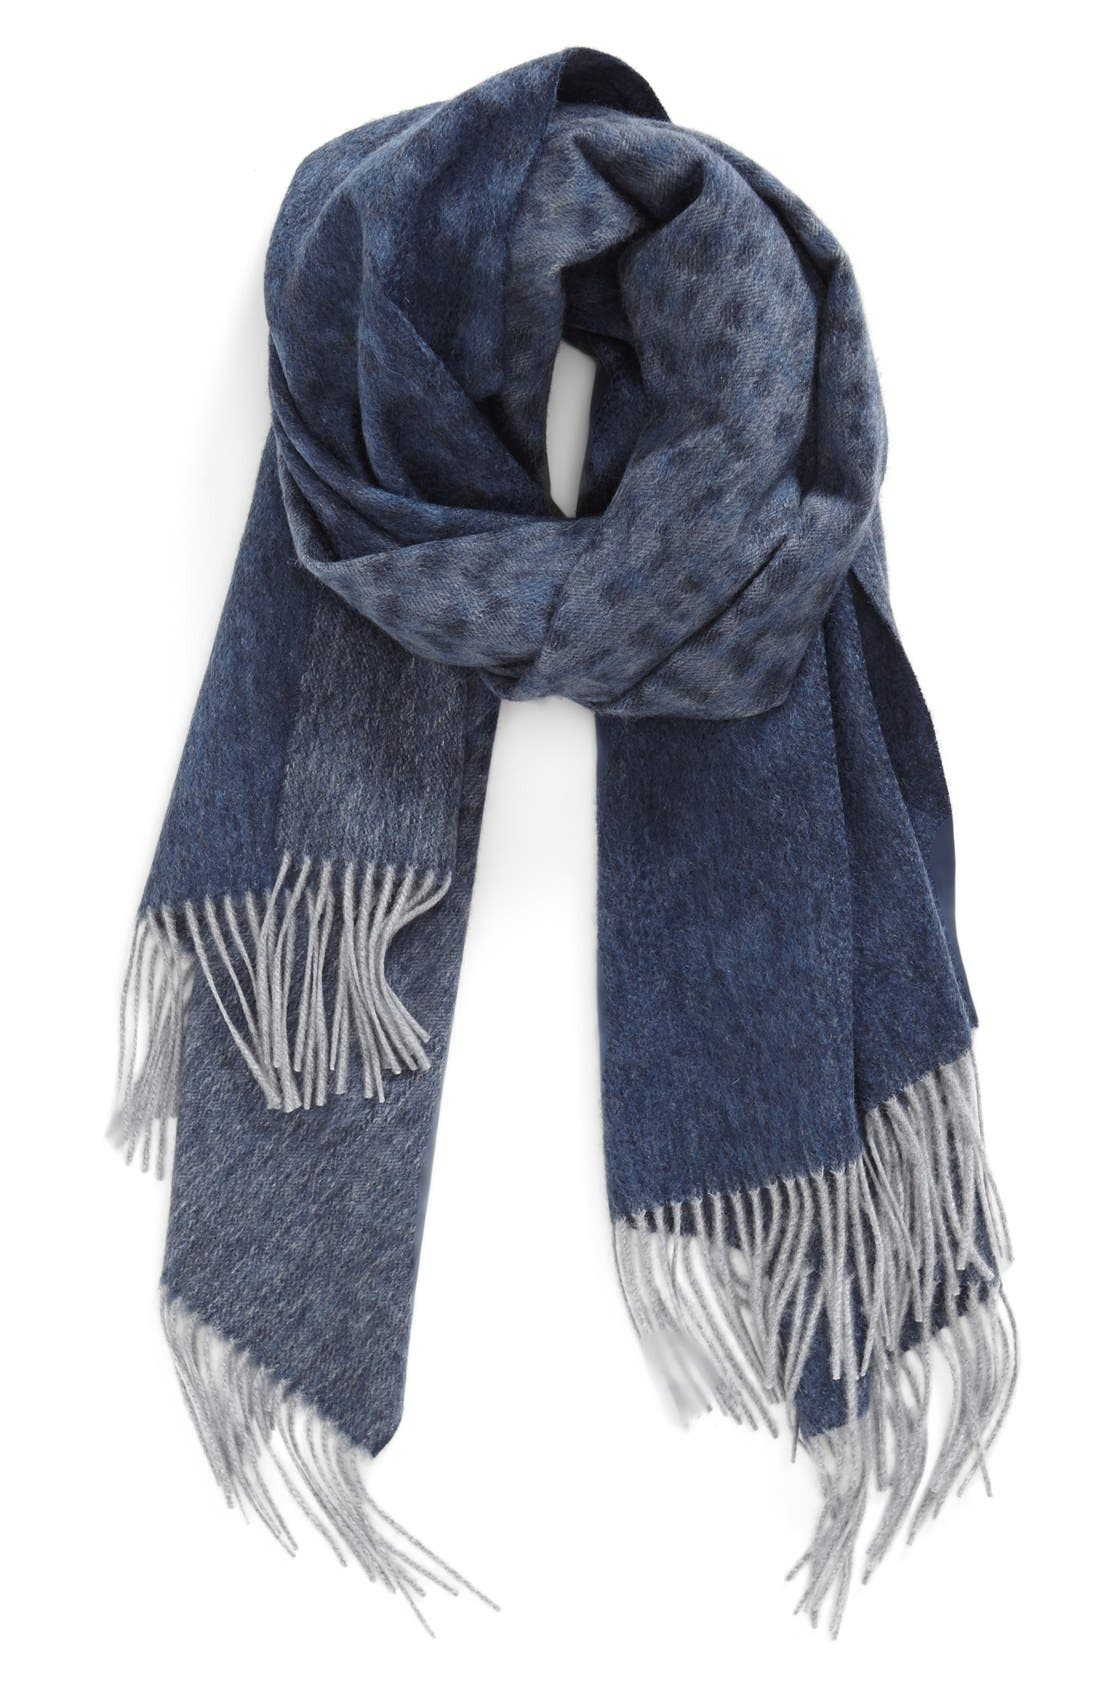 NORDSTROM COLLECTION 'Elusive' Cashmere Wrap, Main, color, 020